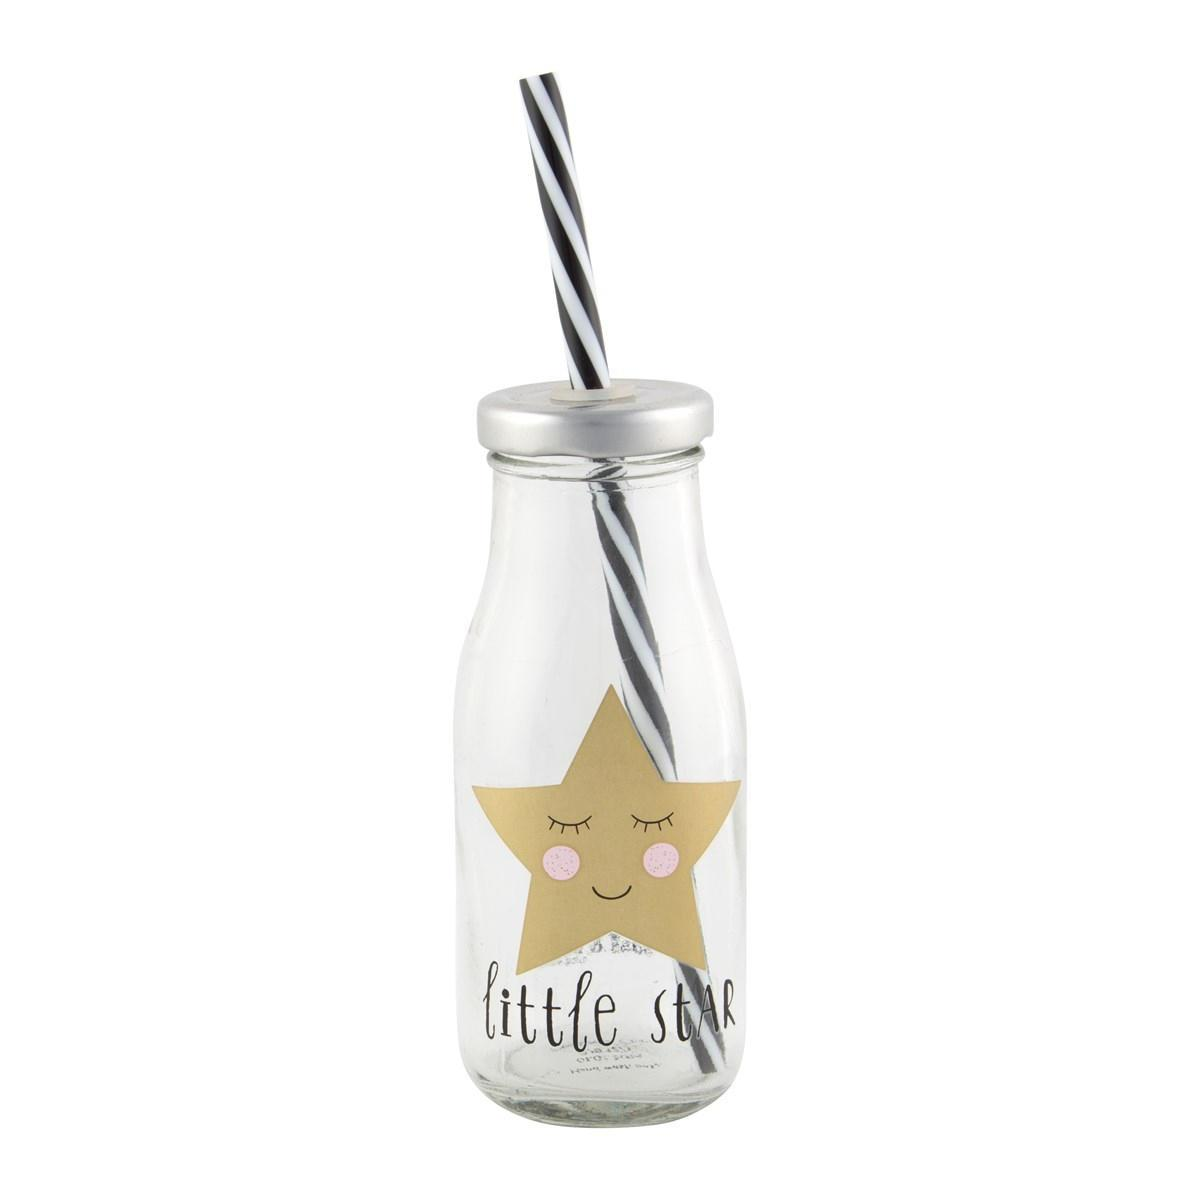 sass & belle Sklenička s víčkem a slámkou Little star, zlatá barva, čirá barva, sklo, plast